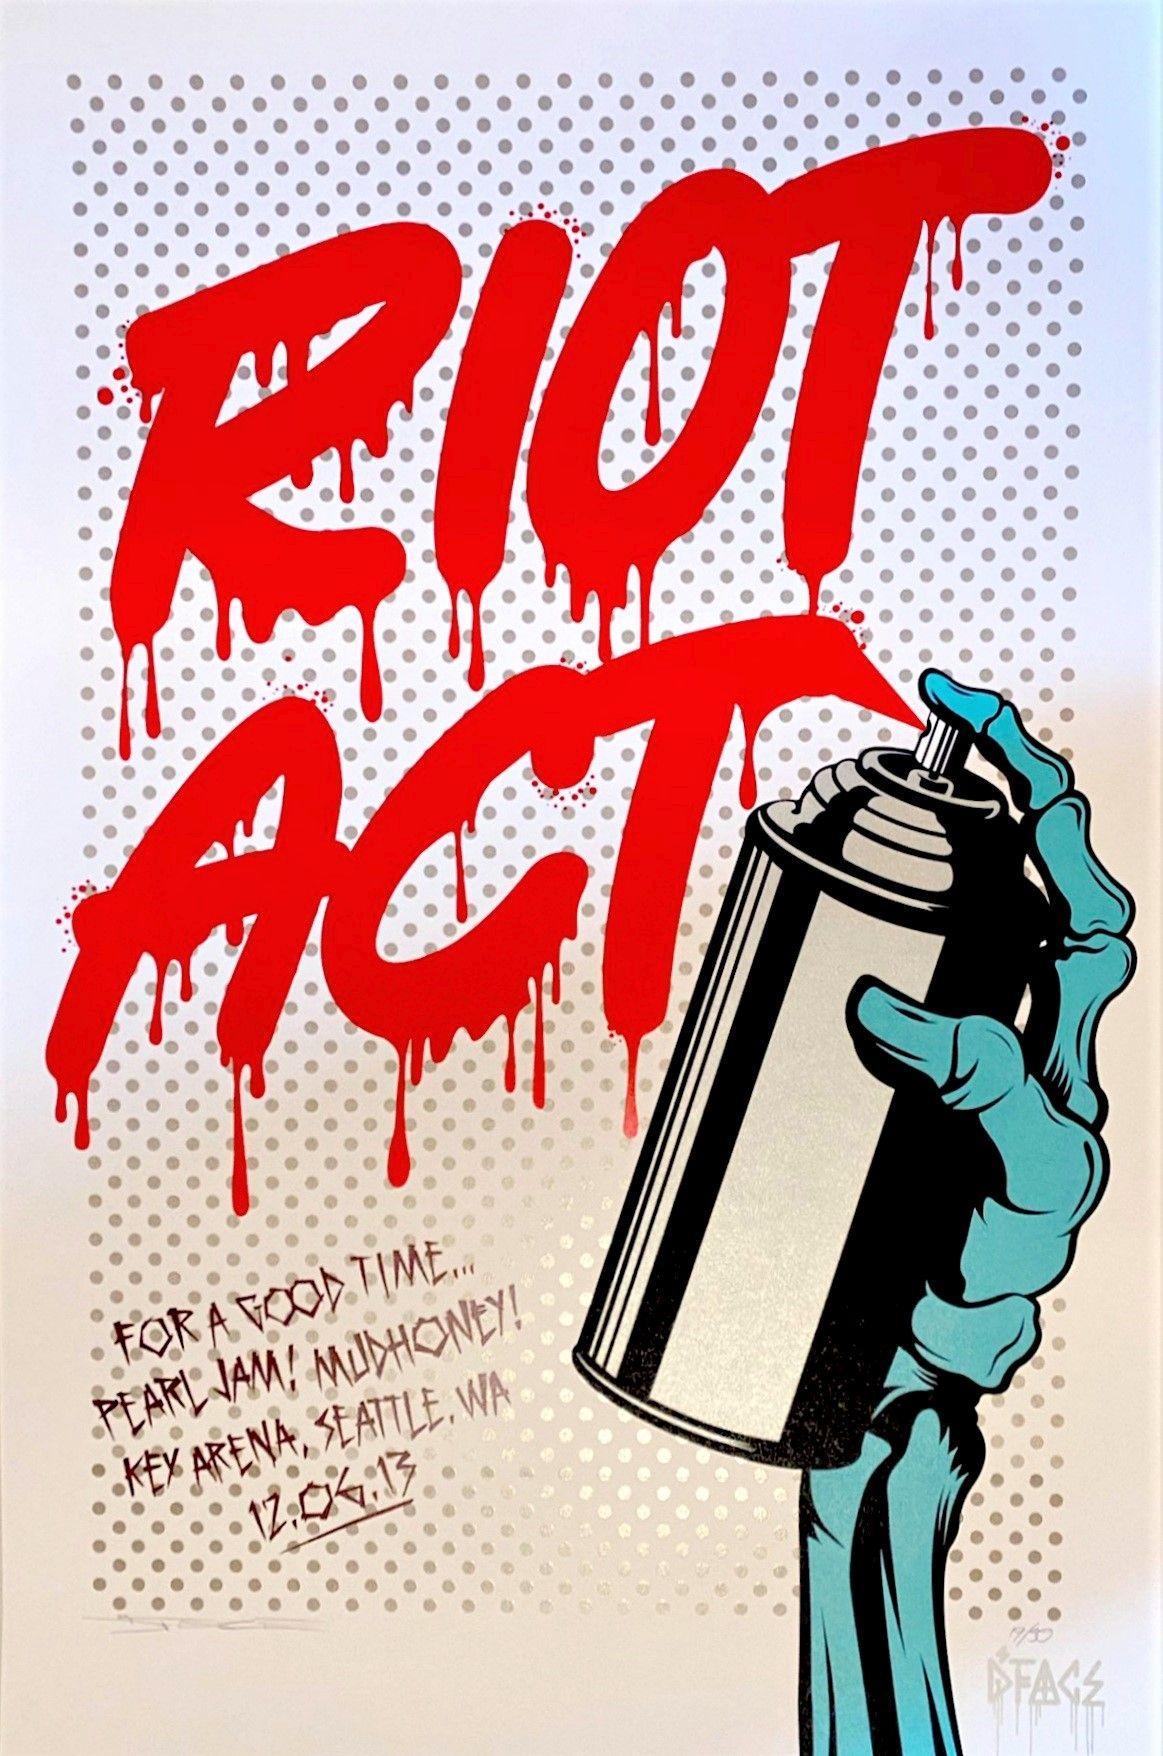 D*Face - Riot Act, 2020